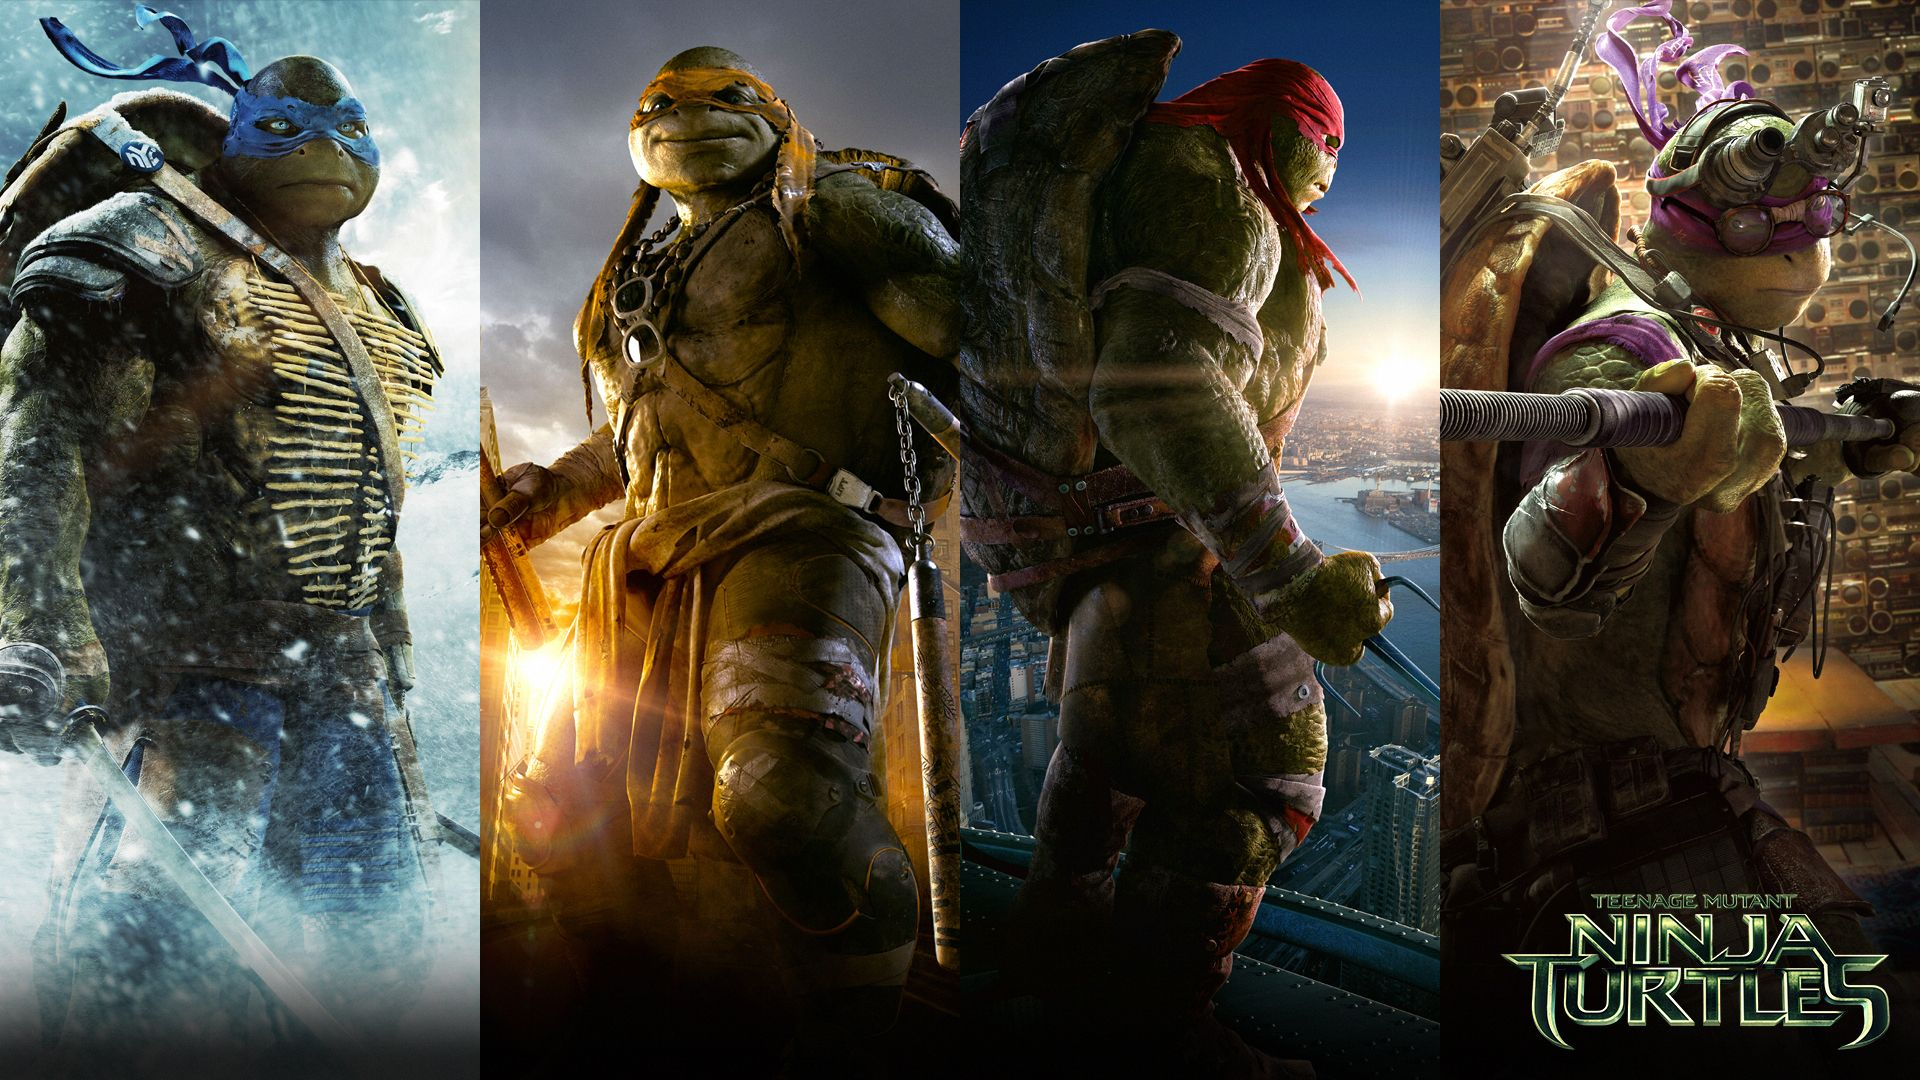 Ninja Turtles Movie Wallpapers Top Free Ninja Turtles Movie